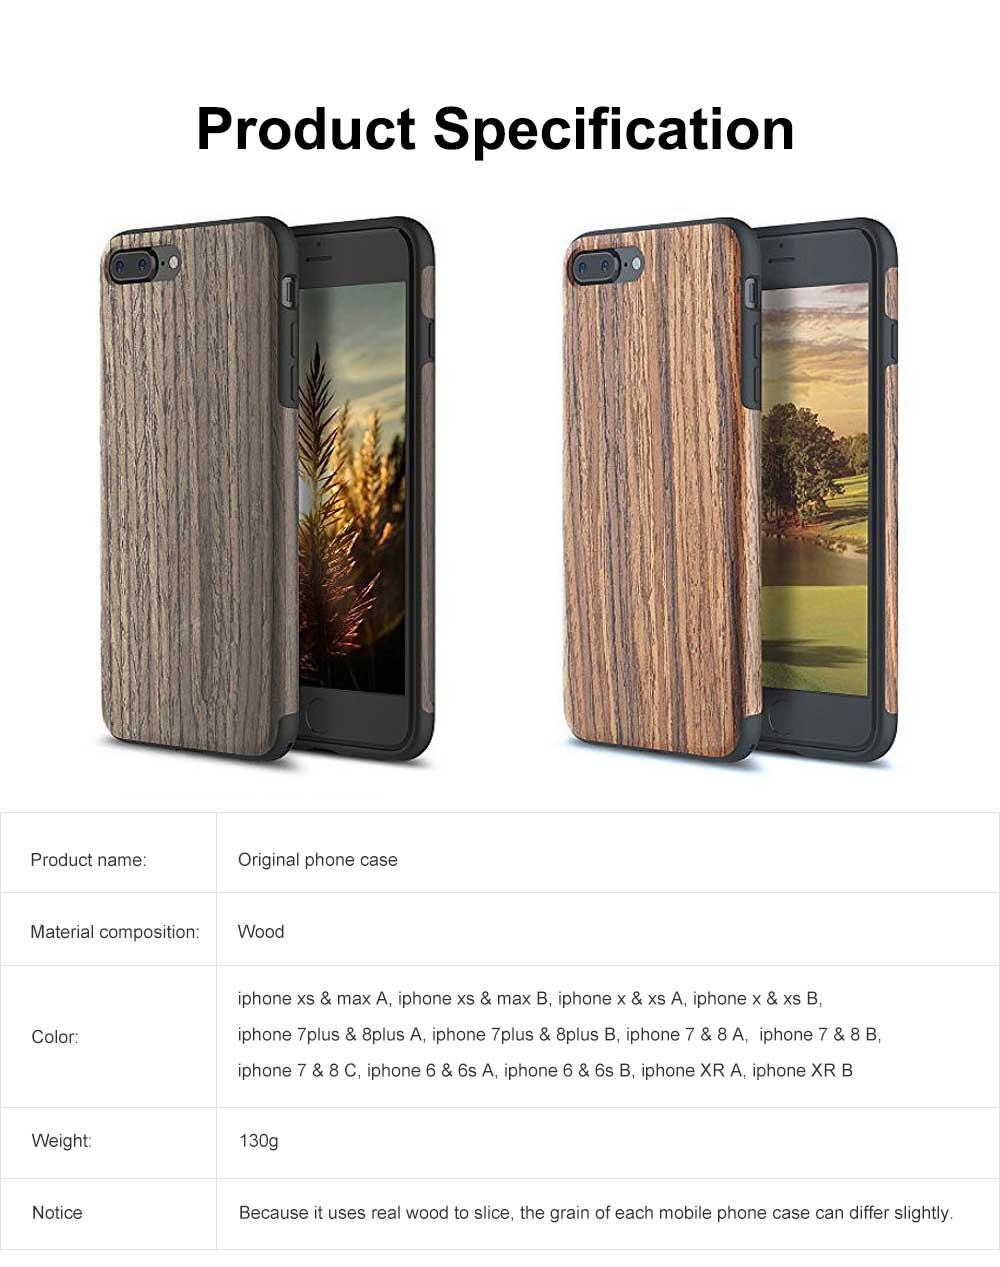 Silicone Anti-fall Phone Case, Fashion Original Phone Case, Wood-made Phone Case for iPhone XS Max, X, XS, 7 Plus, 8 Plus, 7, 8, 6, 6s, XR 6